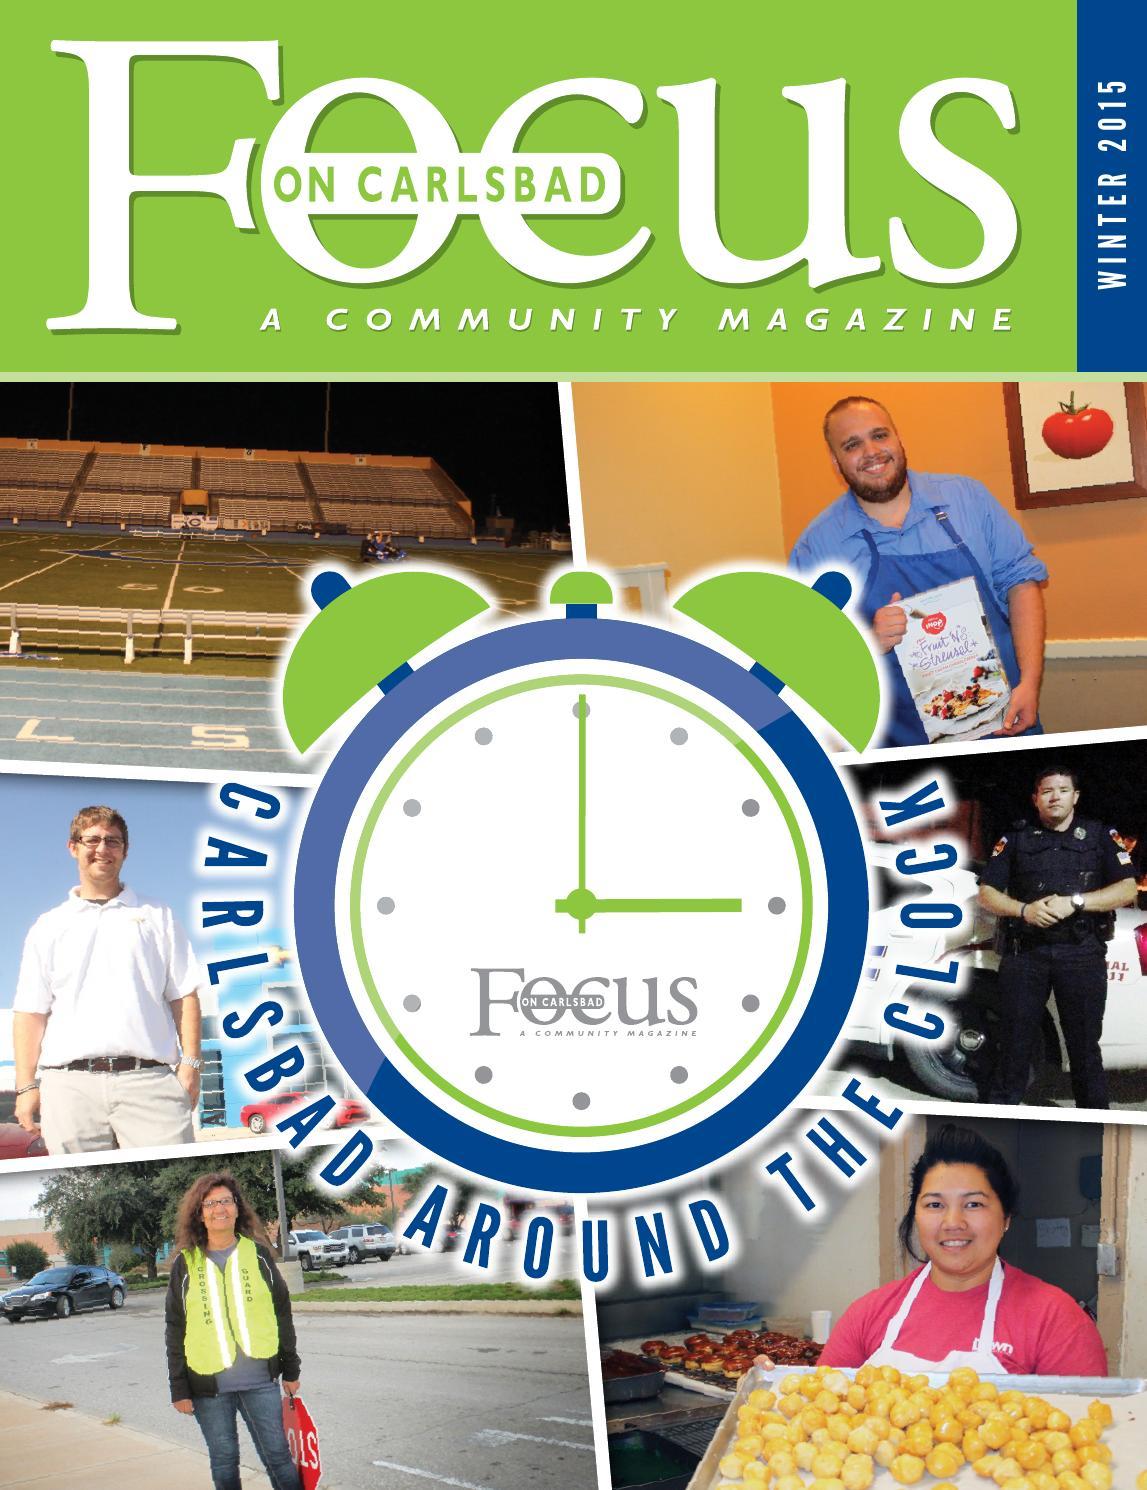 Focus on carlsbad fall 2016 by focusnm.com   issuu